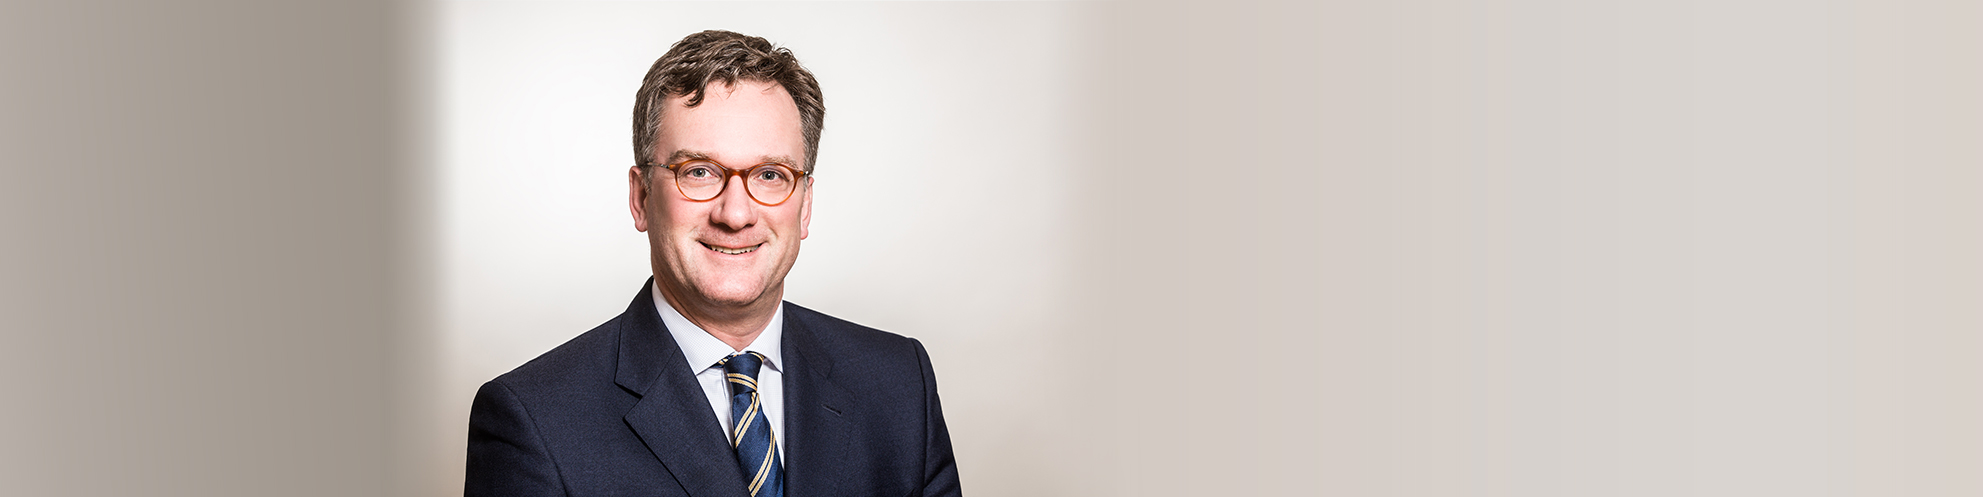 Publikationen & Vorträge - John Booth - Geiersberger Glas & Partner ...